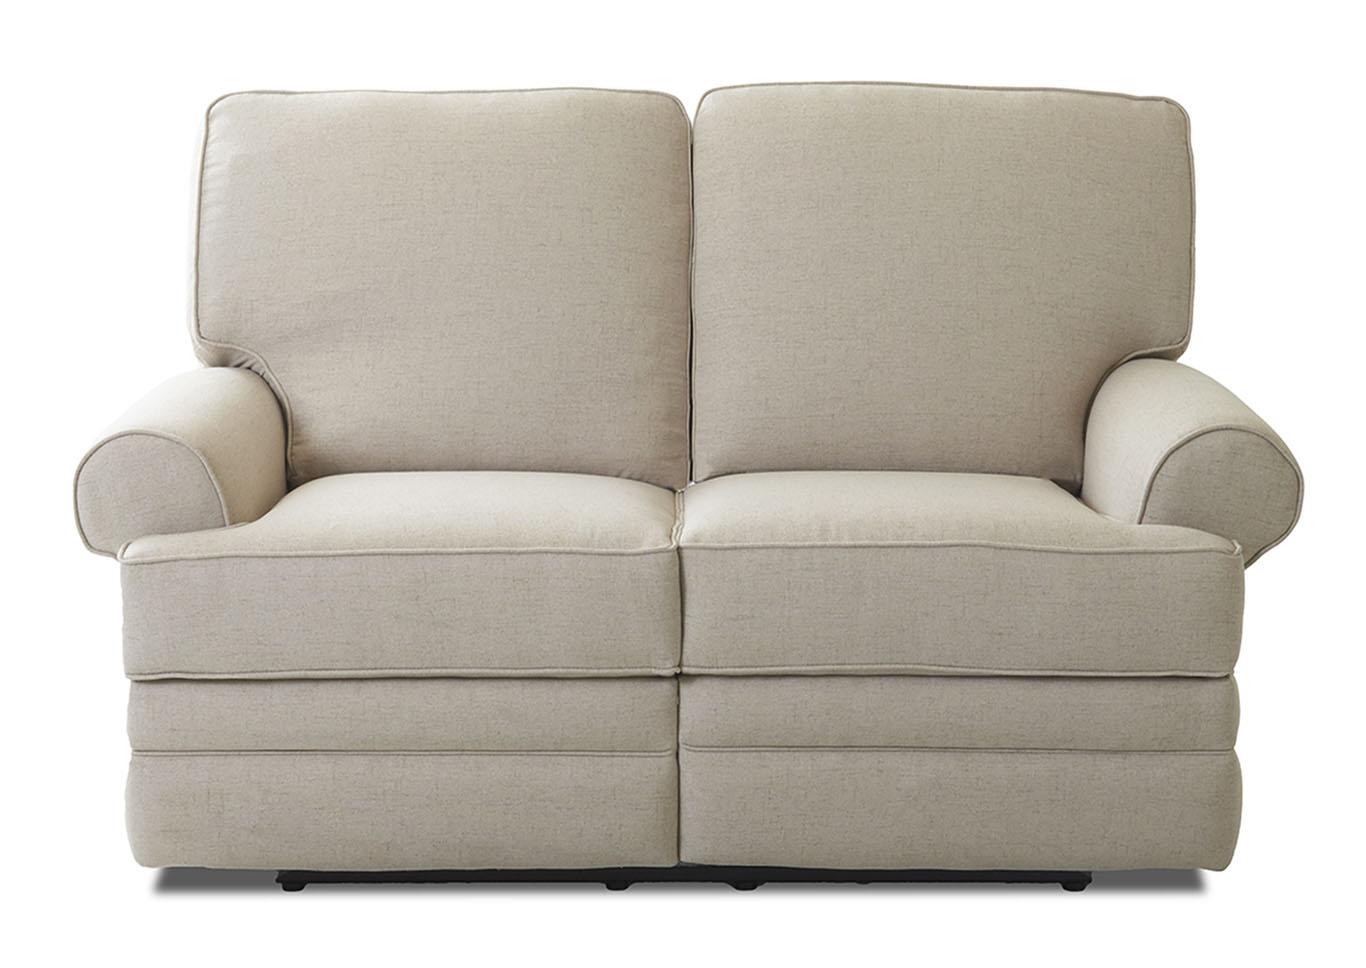 Fantastic Orbit Furniture Ny Belleview Luca Hemp Beige Reclining Alphanode Cool Chair Designs And Ideas Alphanodeonline